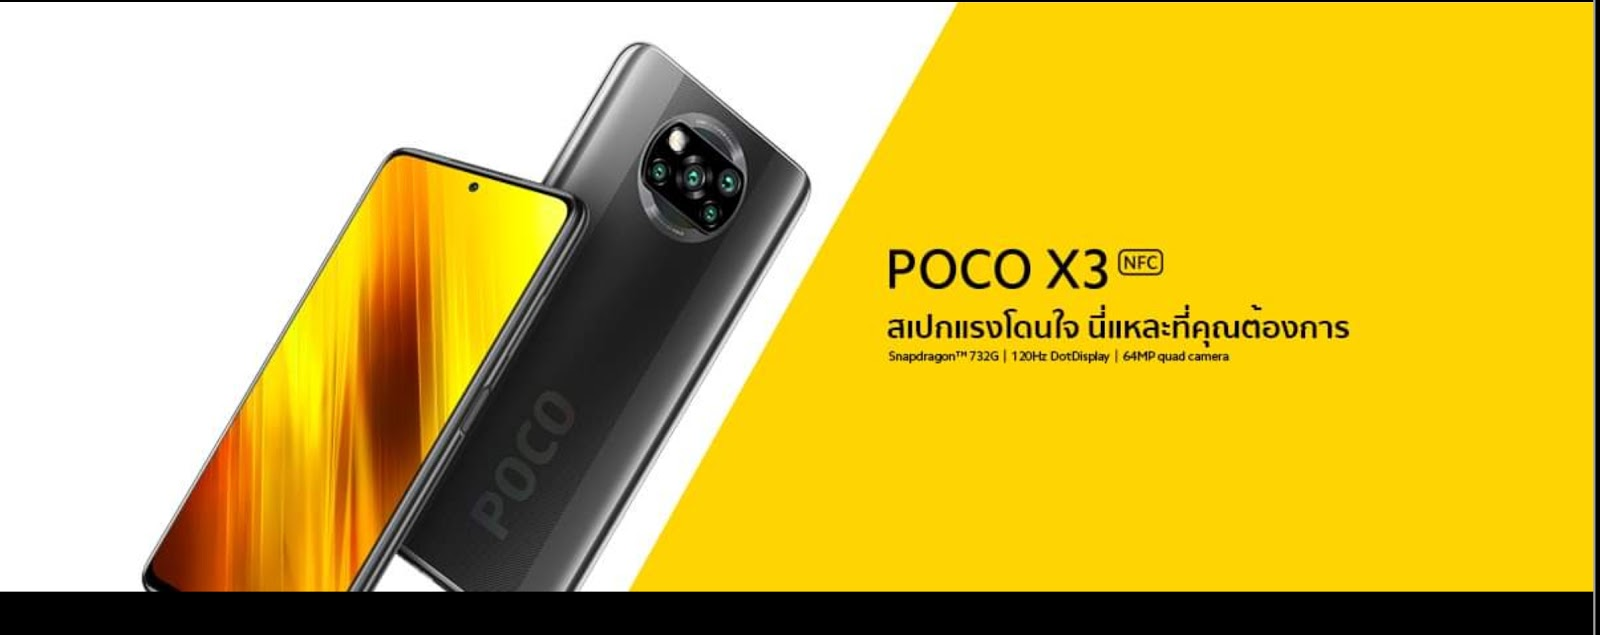 POCO X3 NFC แชมป์แห่งสมาร์ทโฟนระดับกลางหน้าจอ แบตเตอรี่และประสิทธิภาพระดับแนวหน้าจากแบรนด์อันเป็นที่รัก